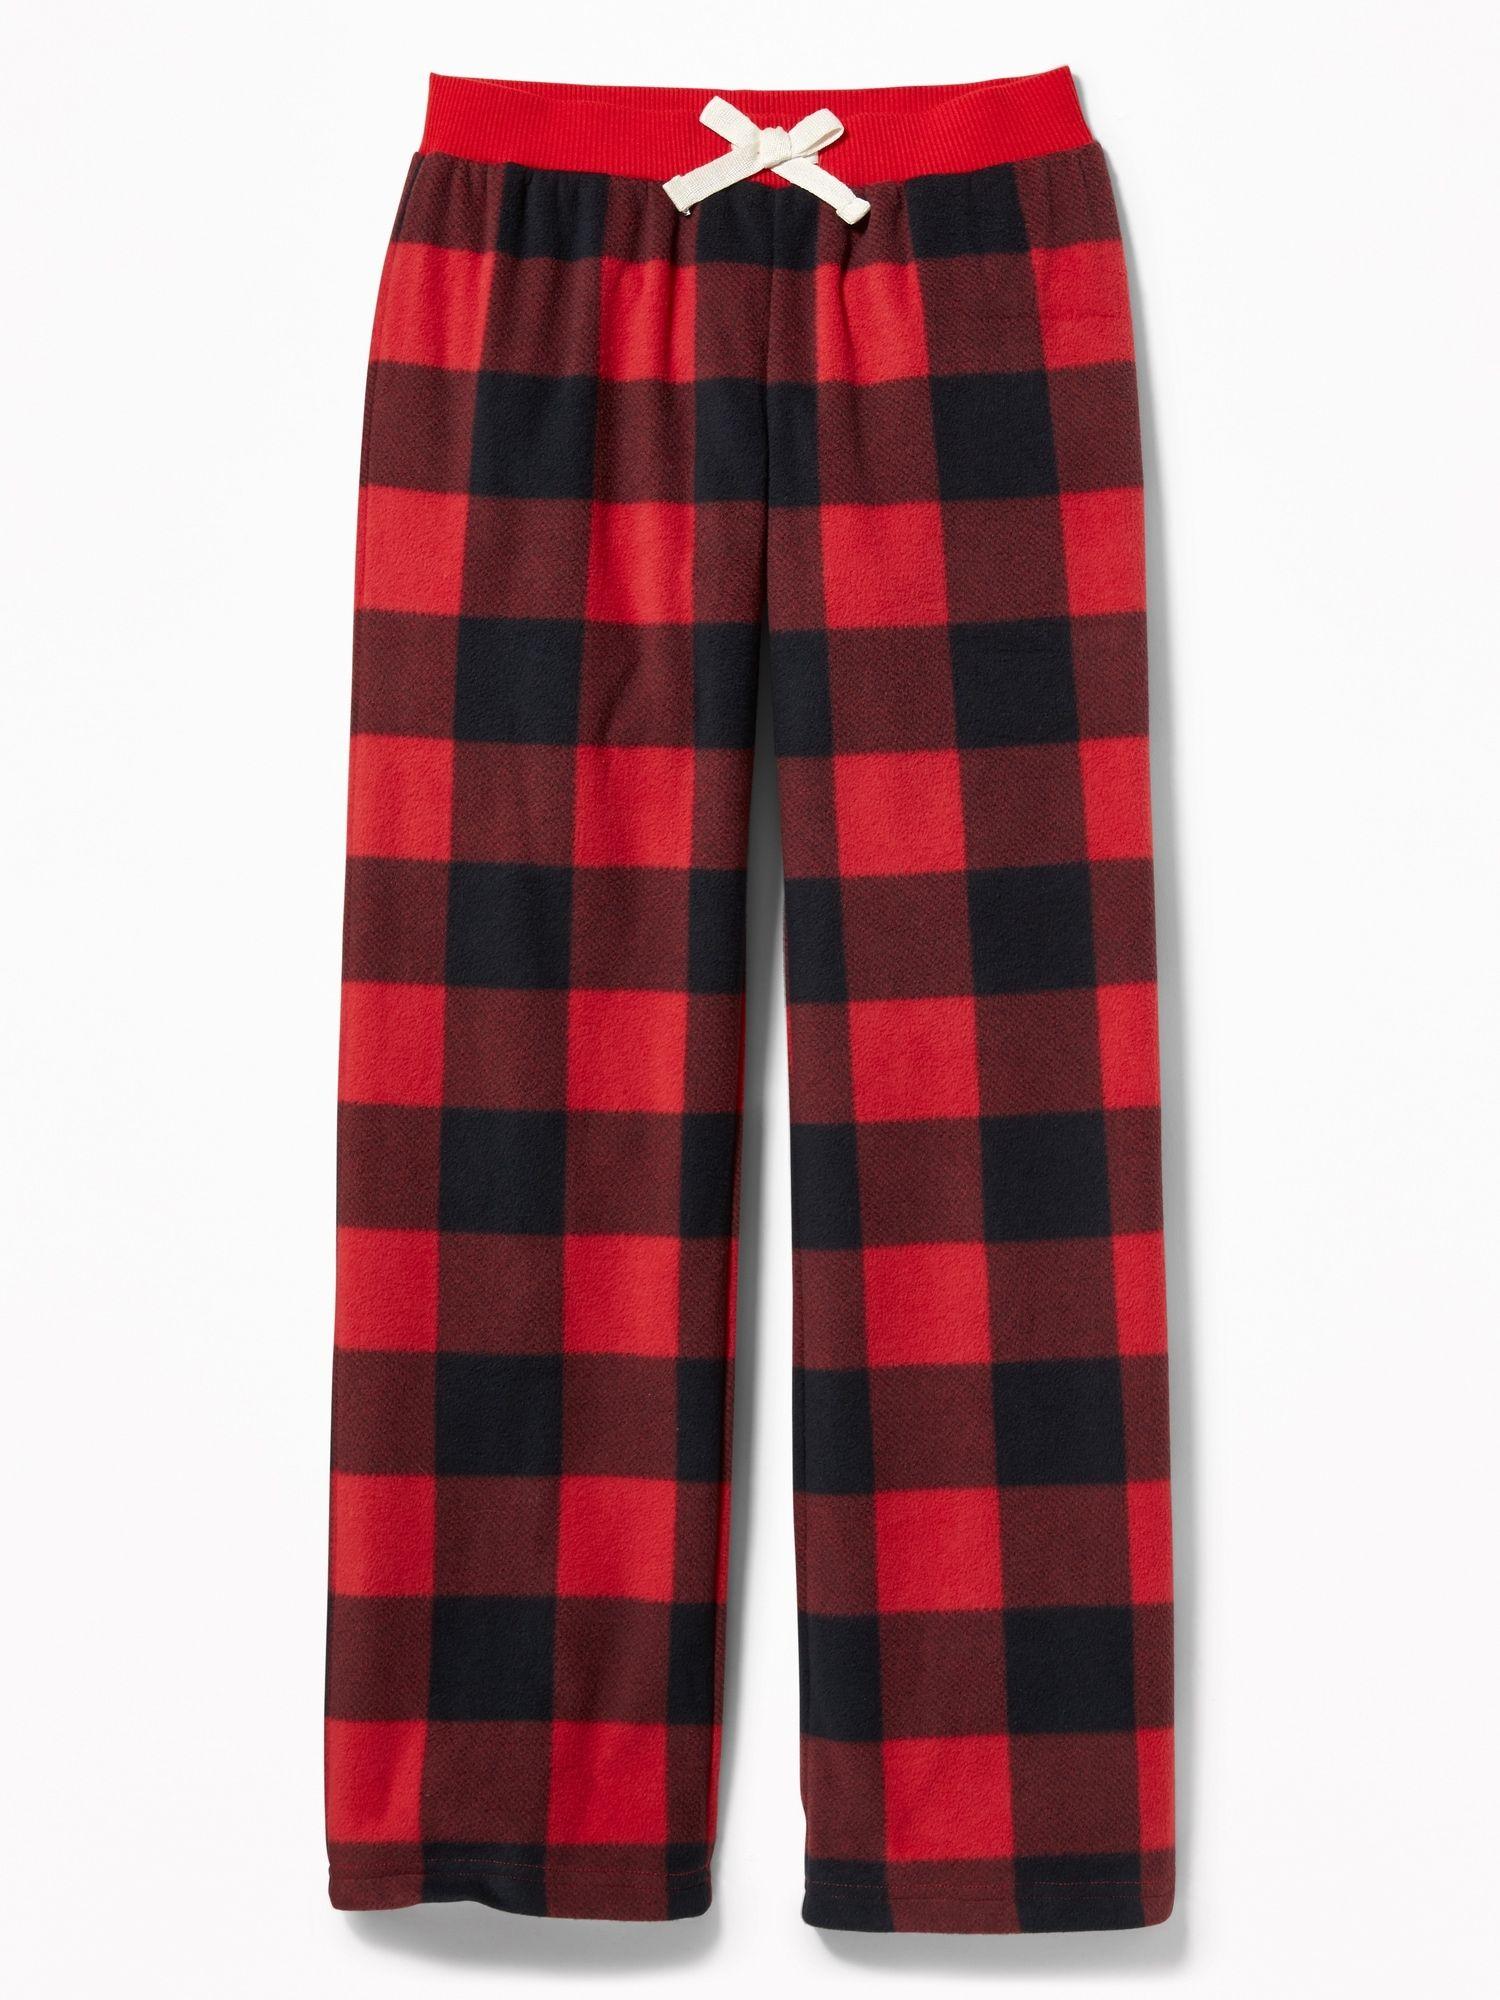 Patterned Micro Performance Fleece Sleep Pants for Girls   Old Navy ...